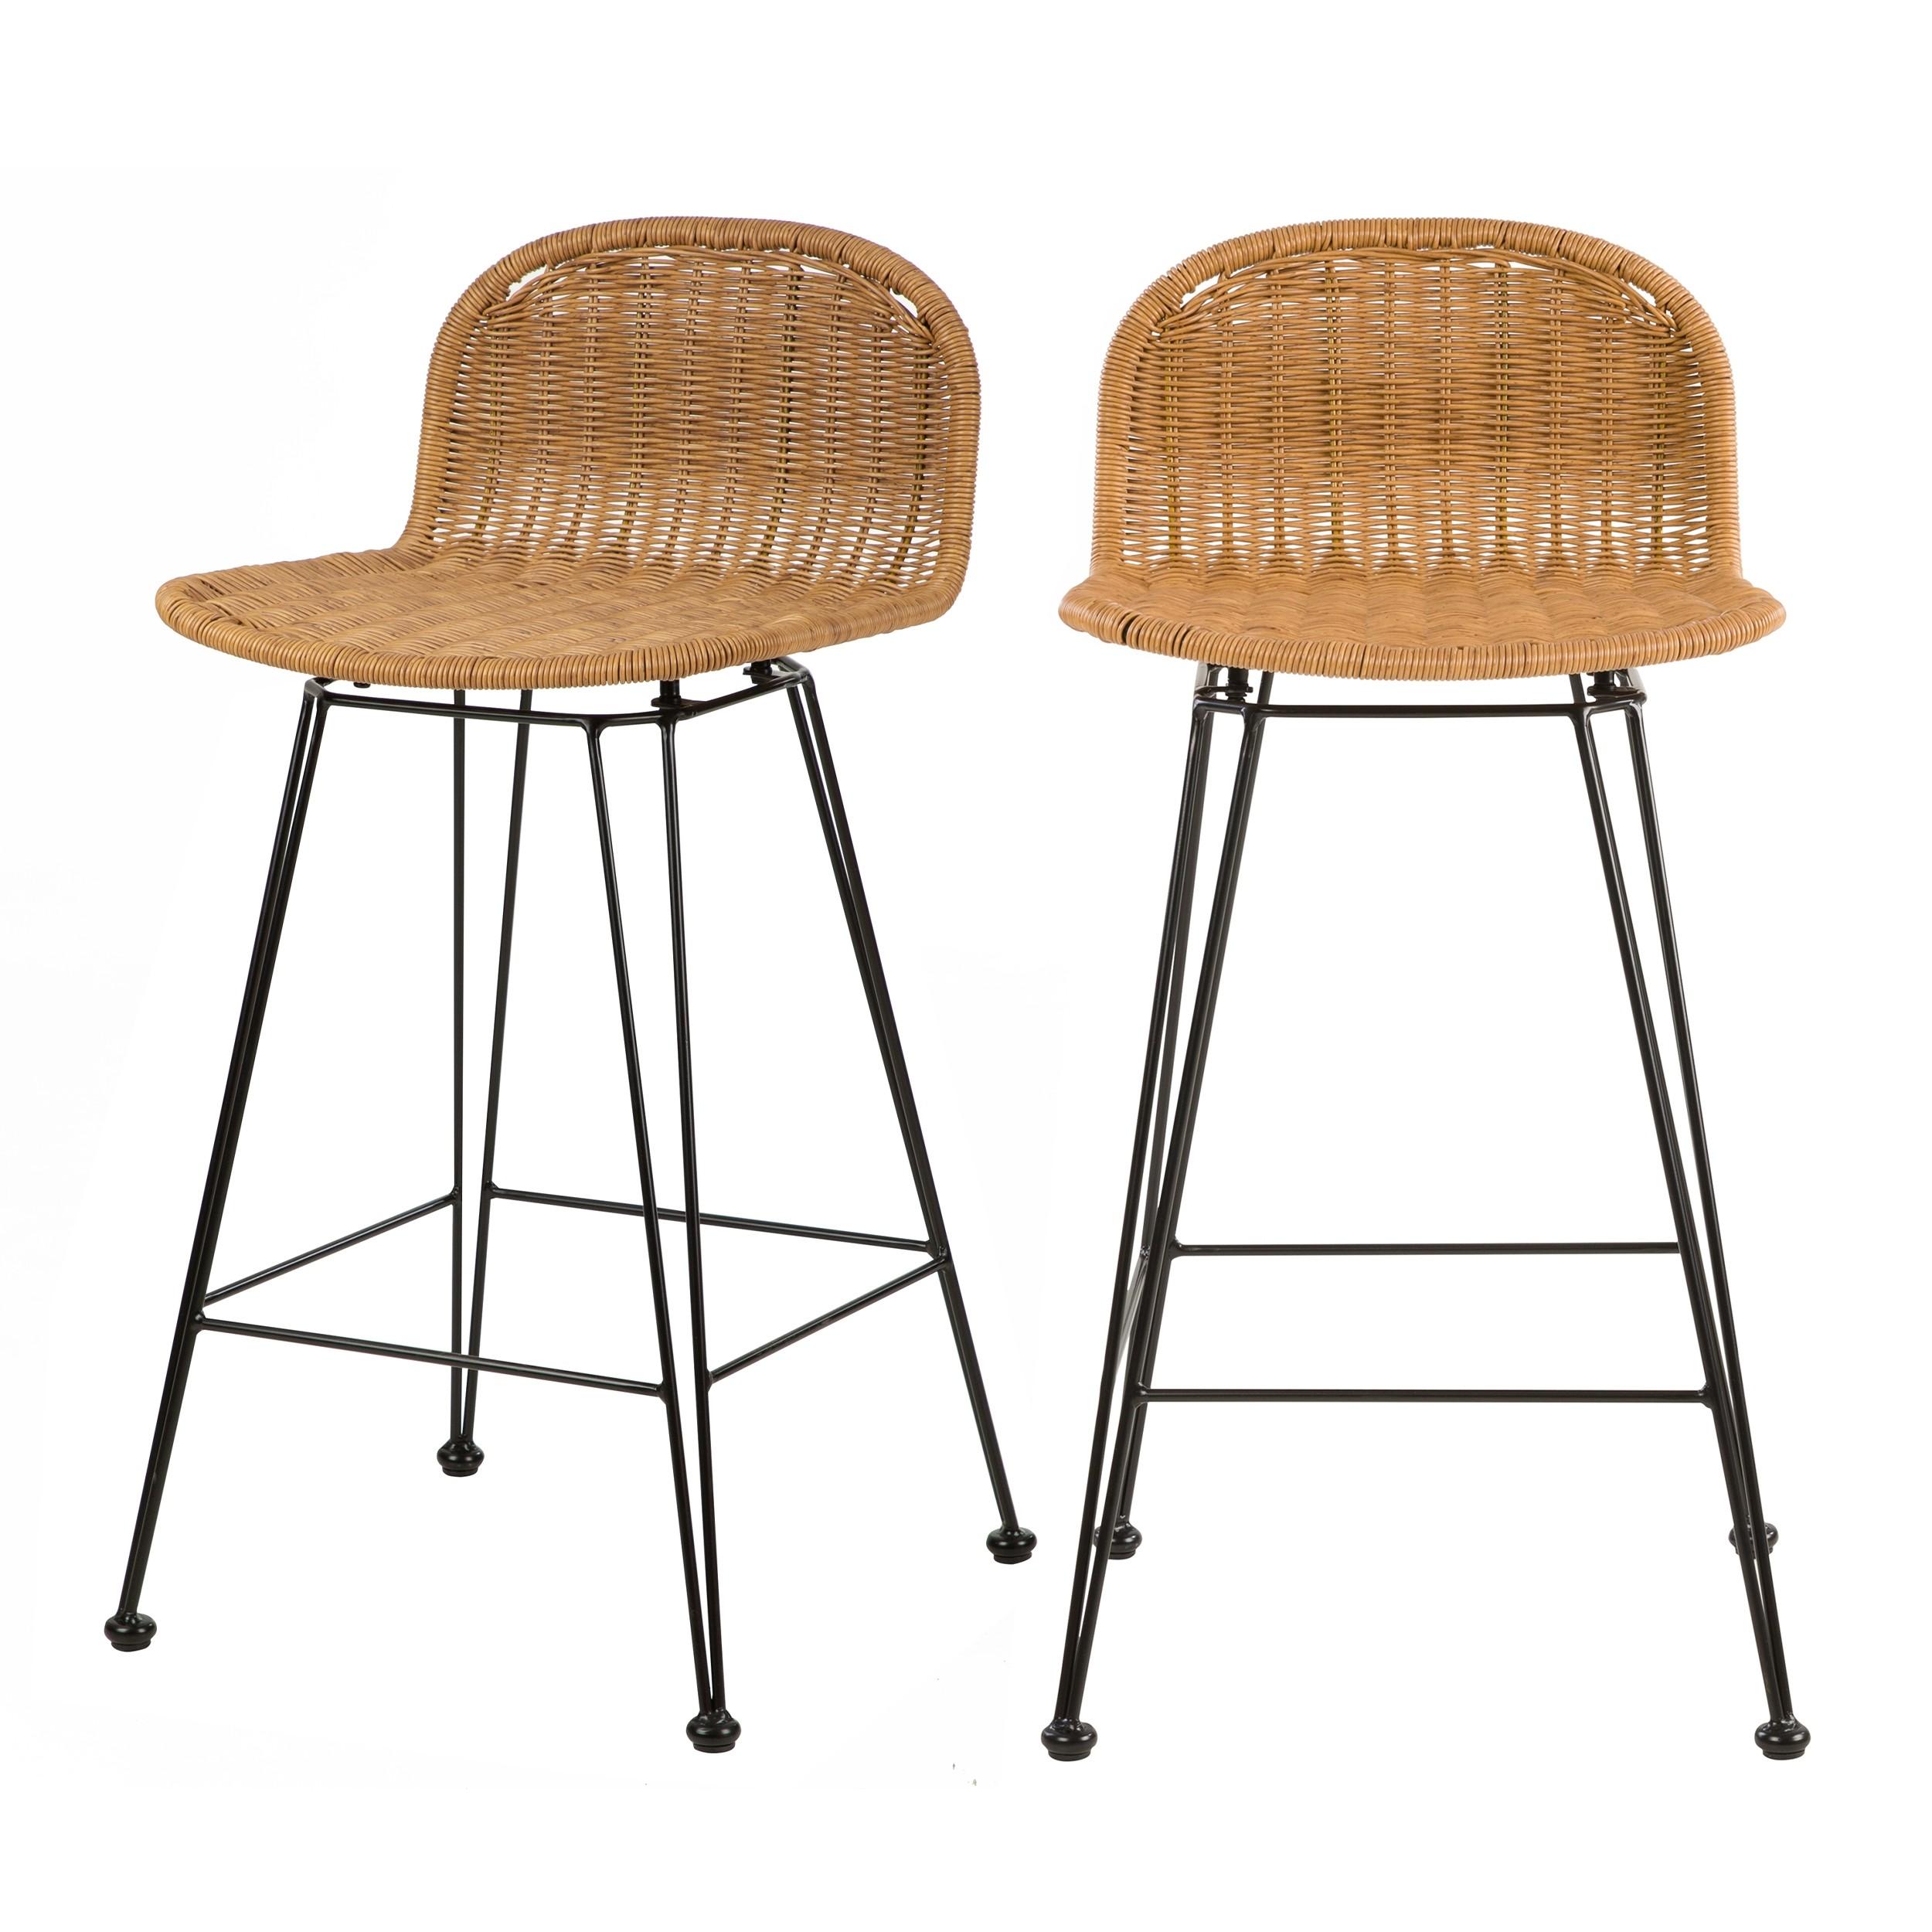 acheter chaise de bar en resine tressee naturelle lot de 2